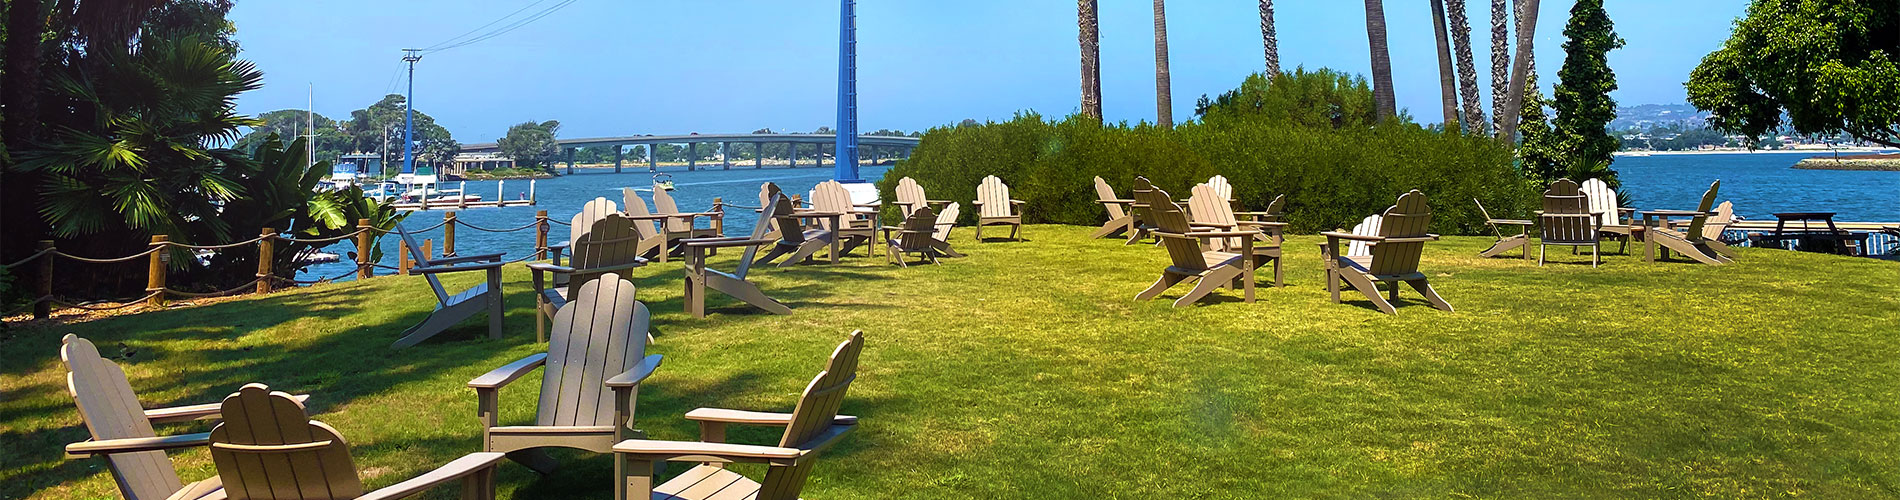 Waterfront dining at SeaWorld San Diego